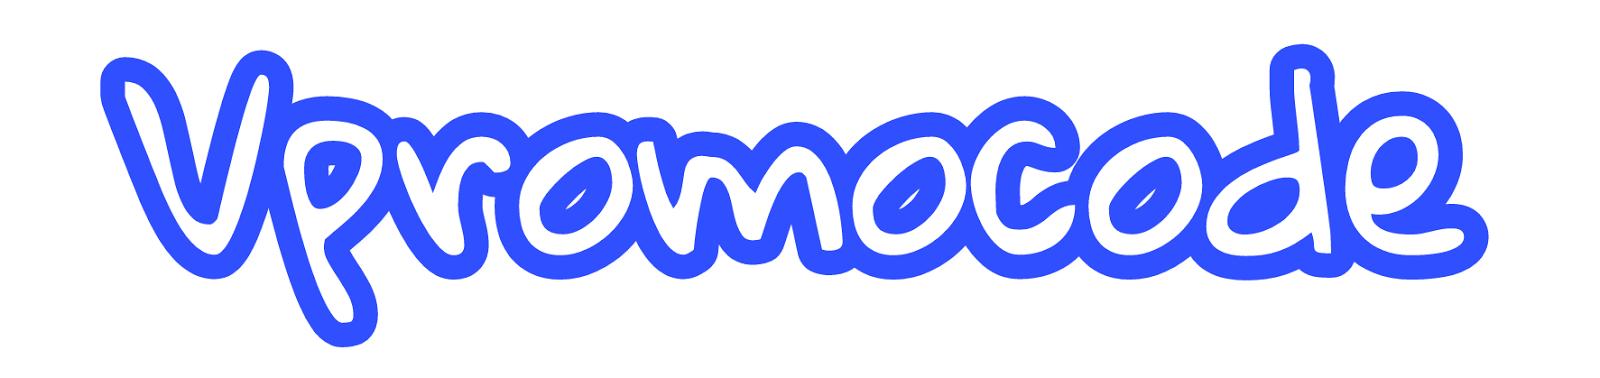 Vpromocode